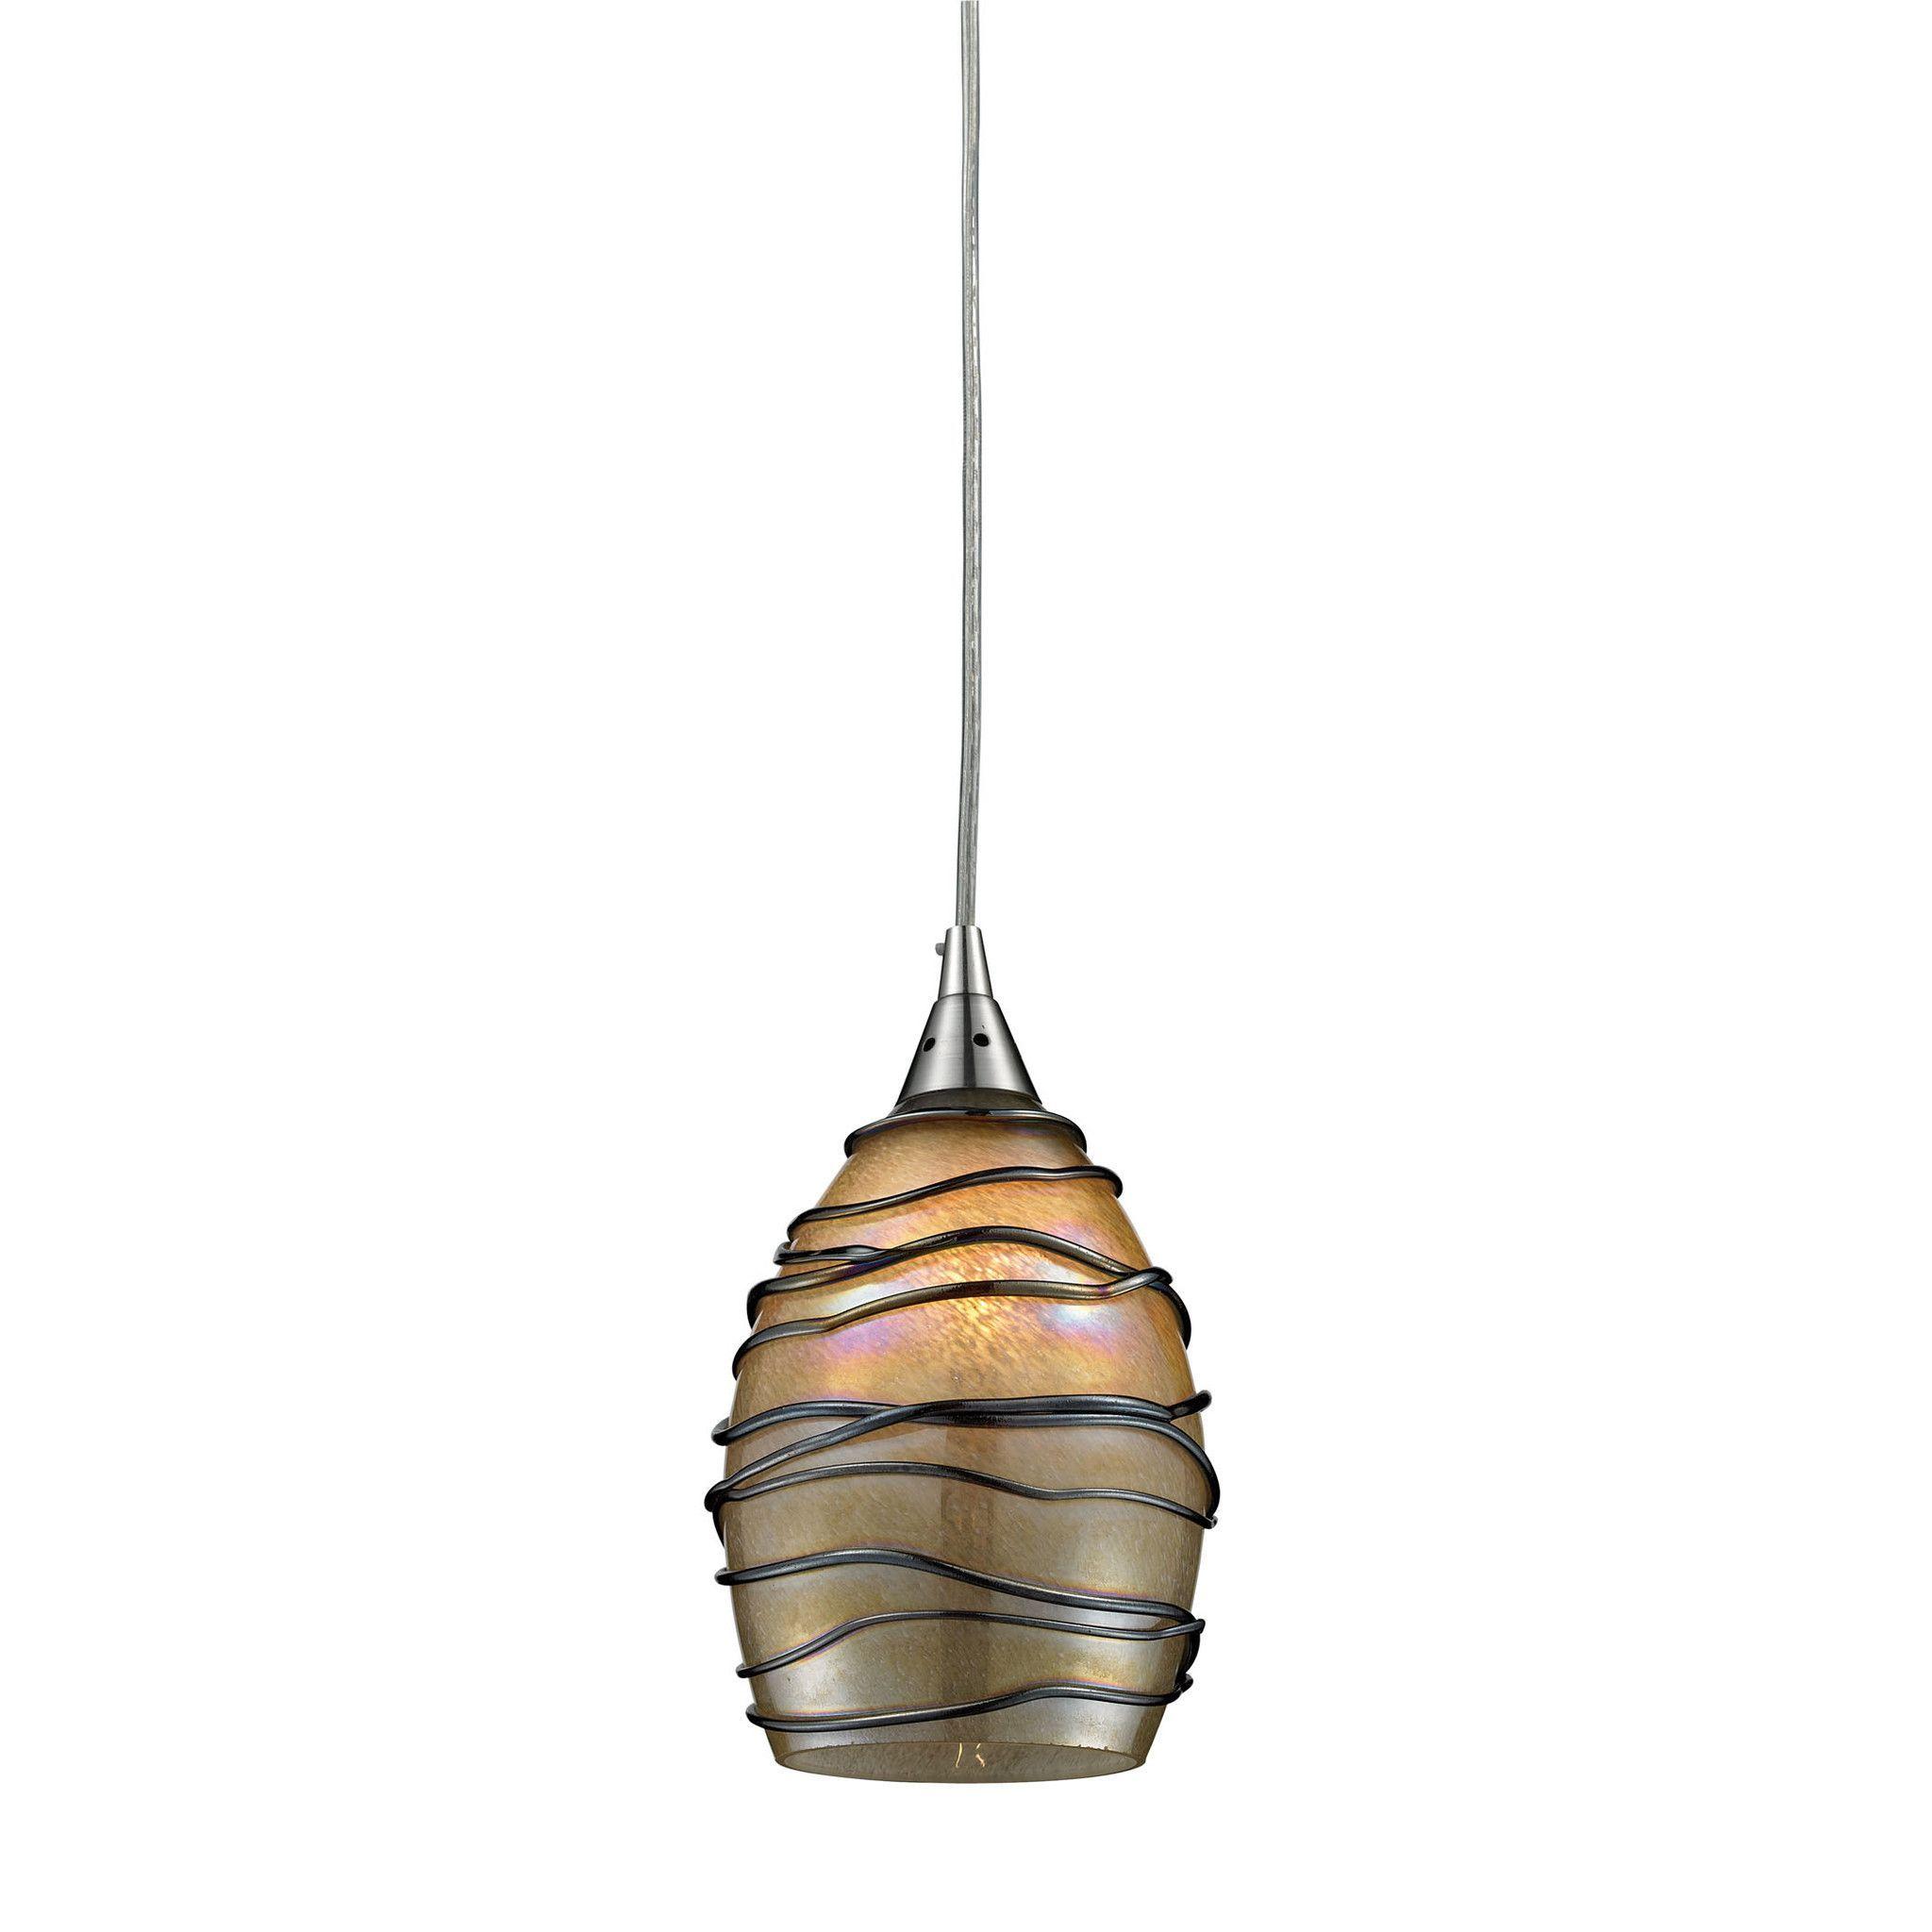 ELK Lighting 1 LED Vines Collection Satin Nickel Finish